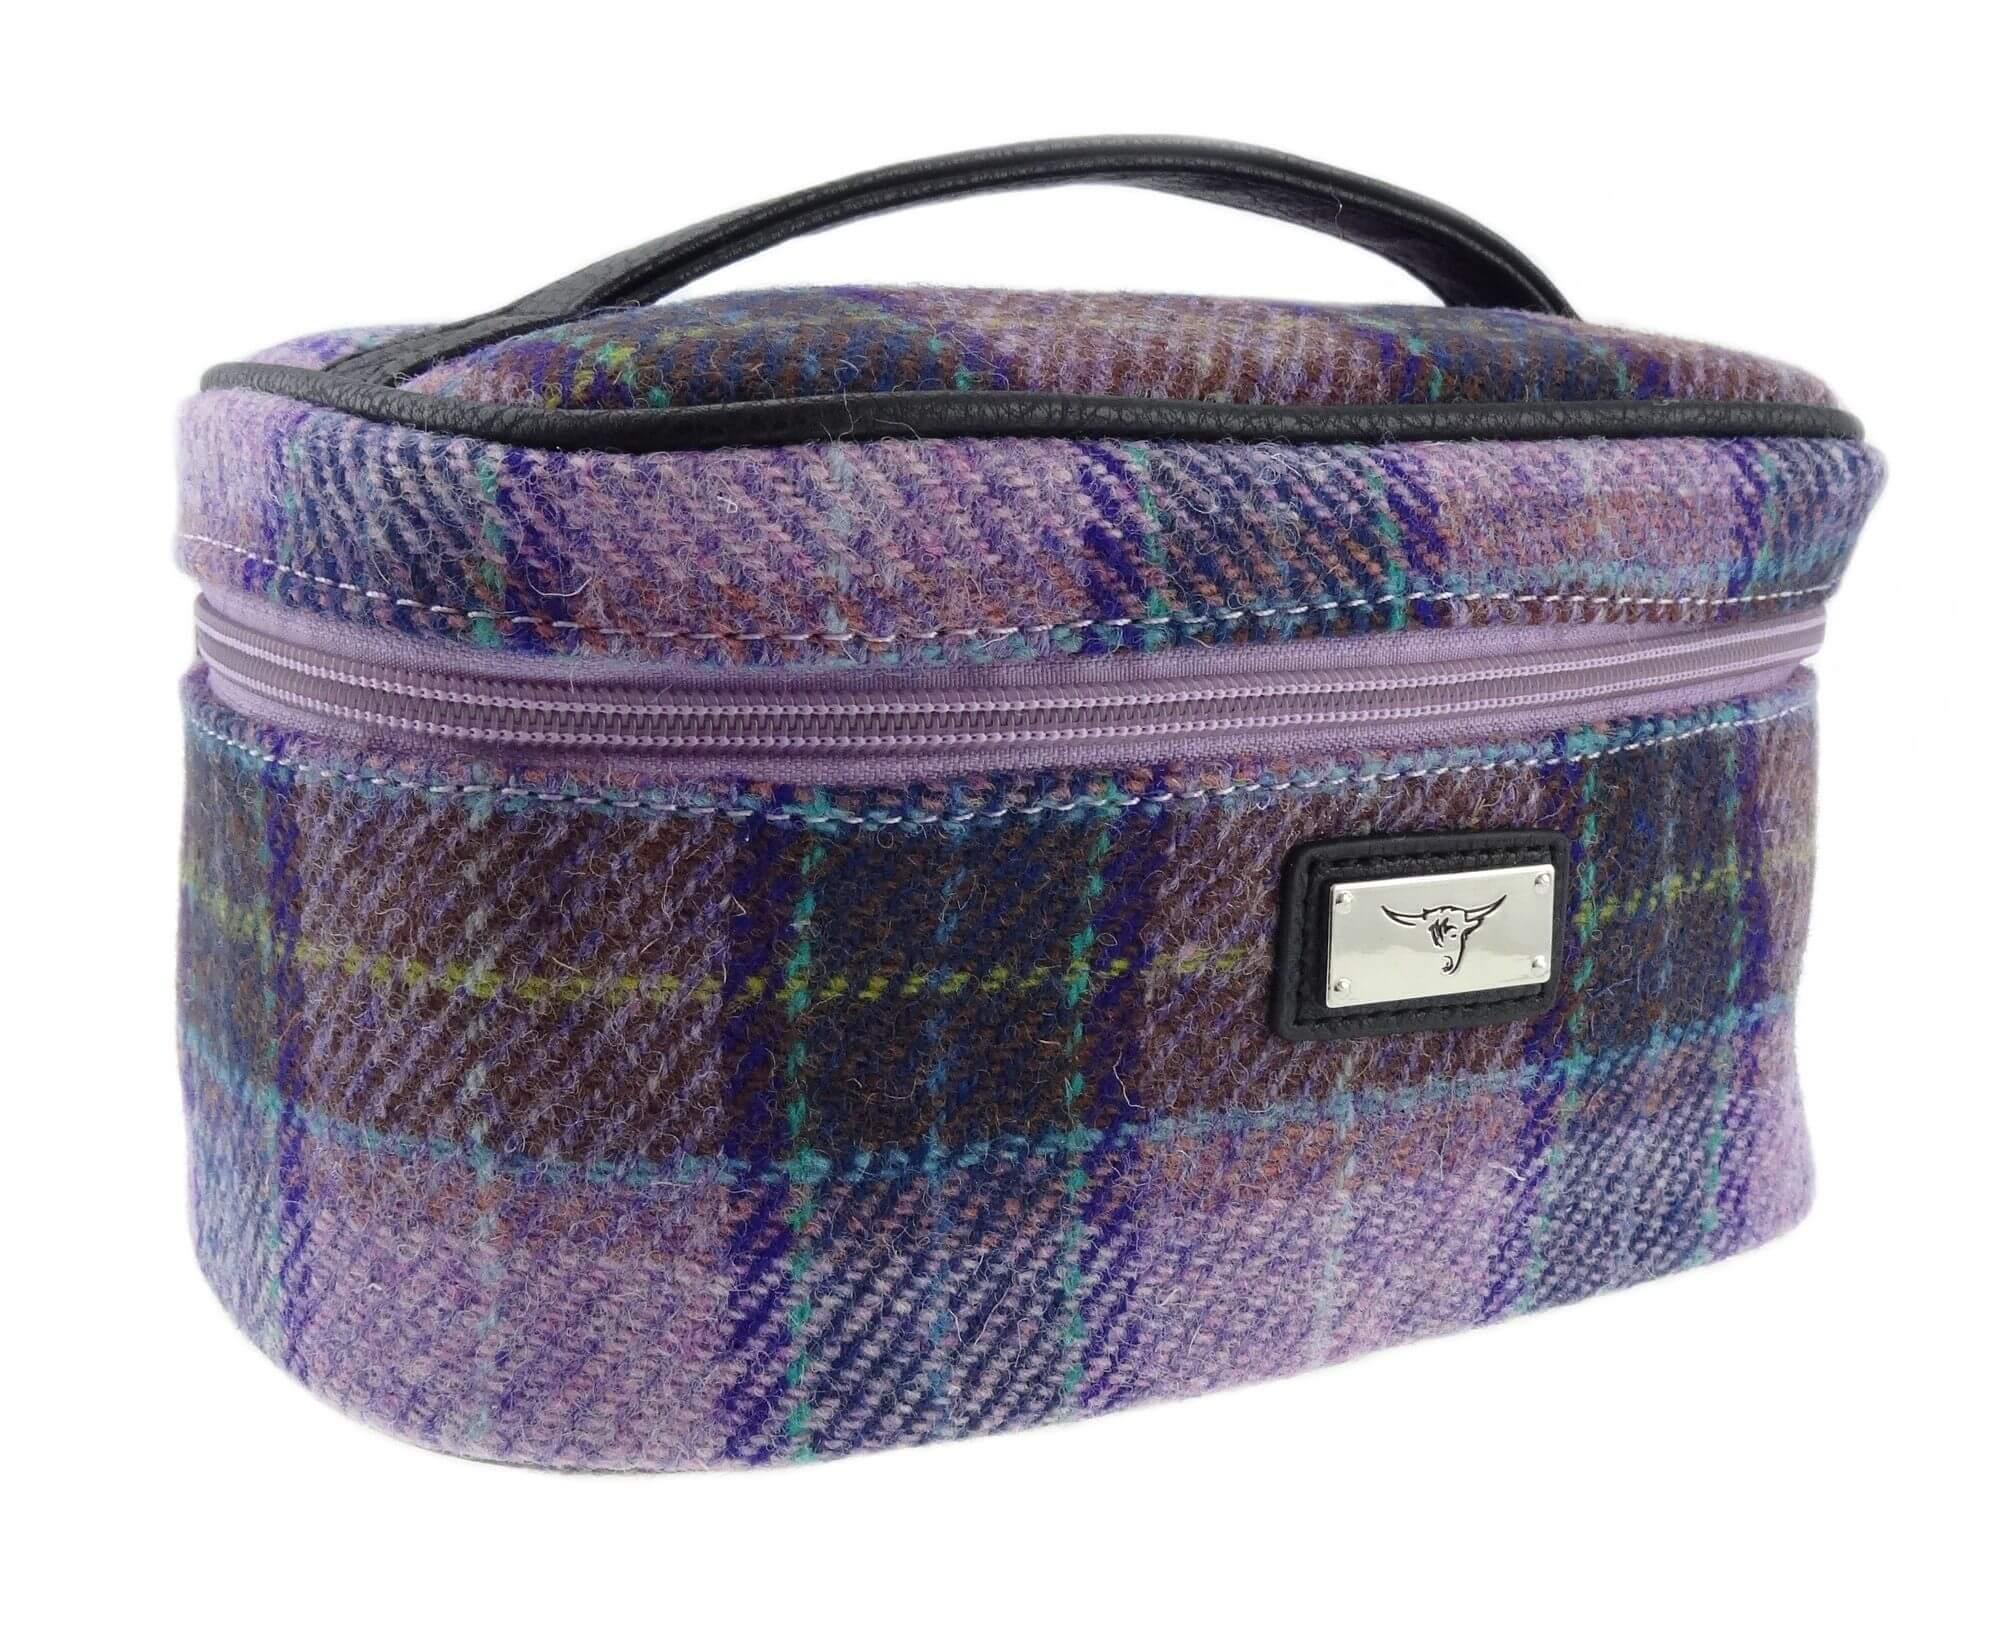 Harris Tweed Cosmetic Bag LB2103-COL34